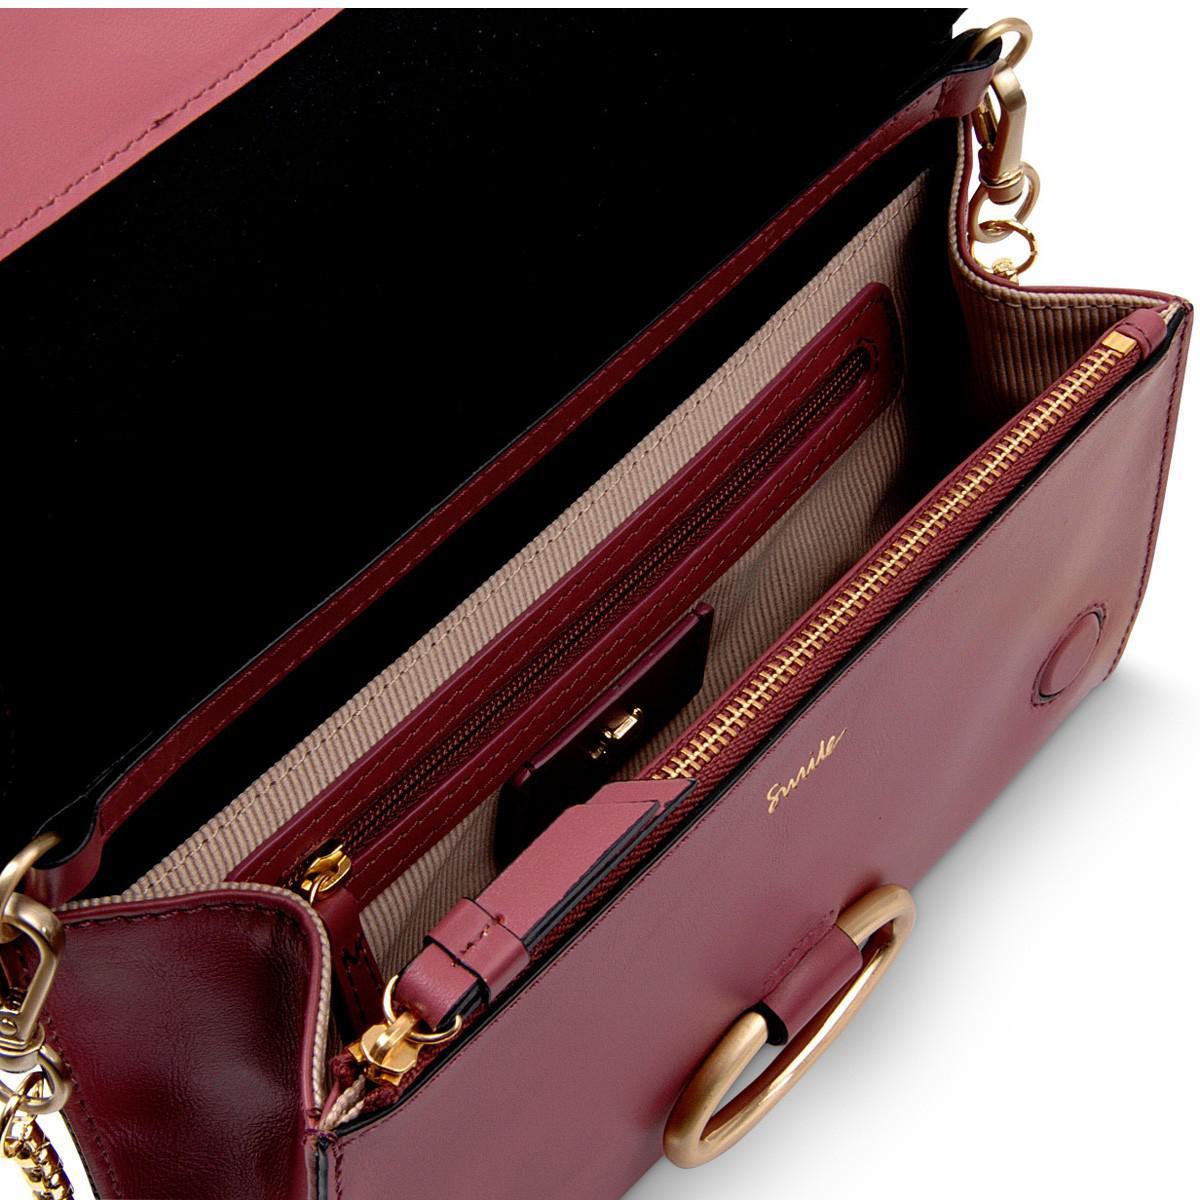 Radley Leather Blackheath Small Flapover Cross Body Bag